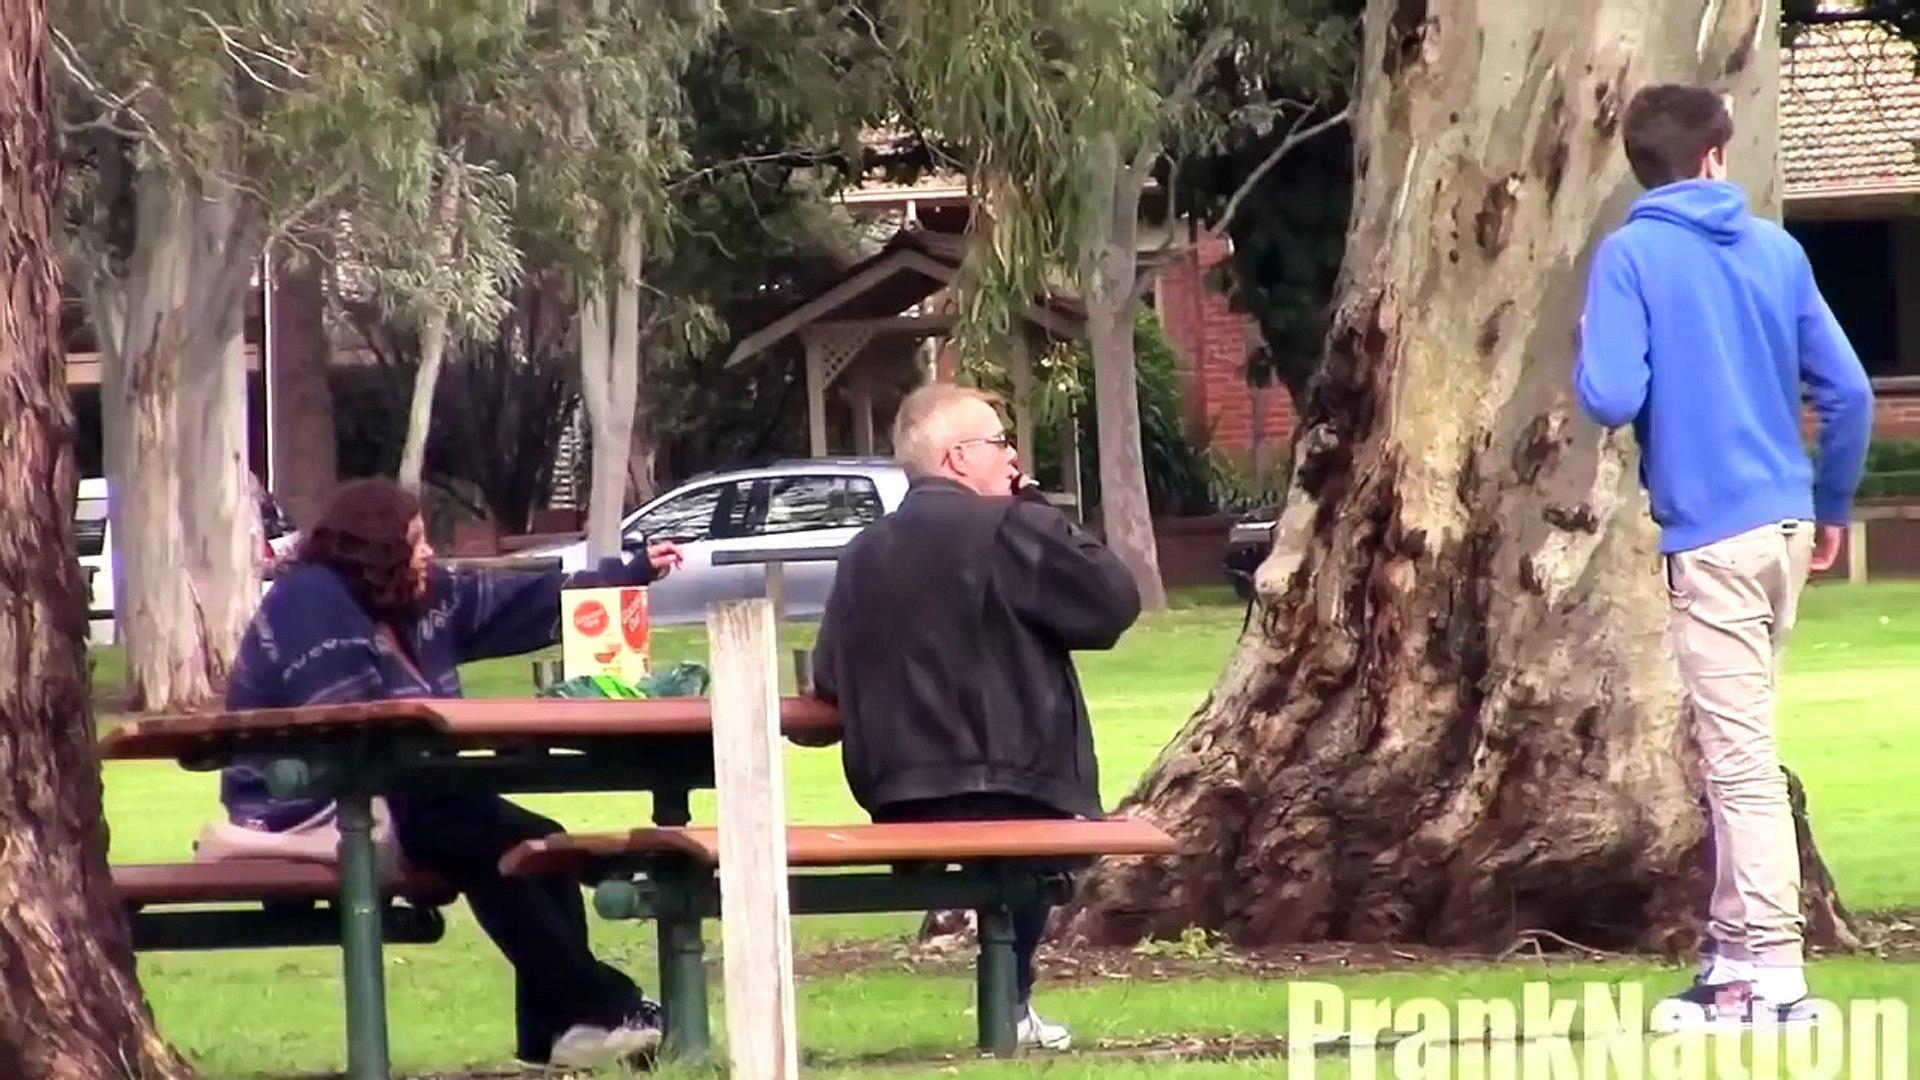 Scary Prank Slashed Face Prank Funny Pranks Pranks on People Best Pranks 2014